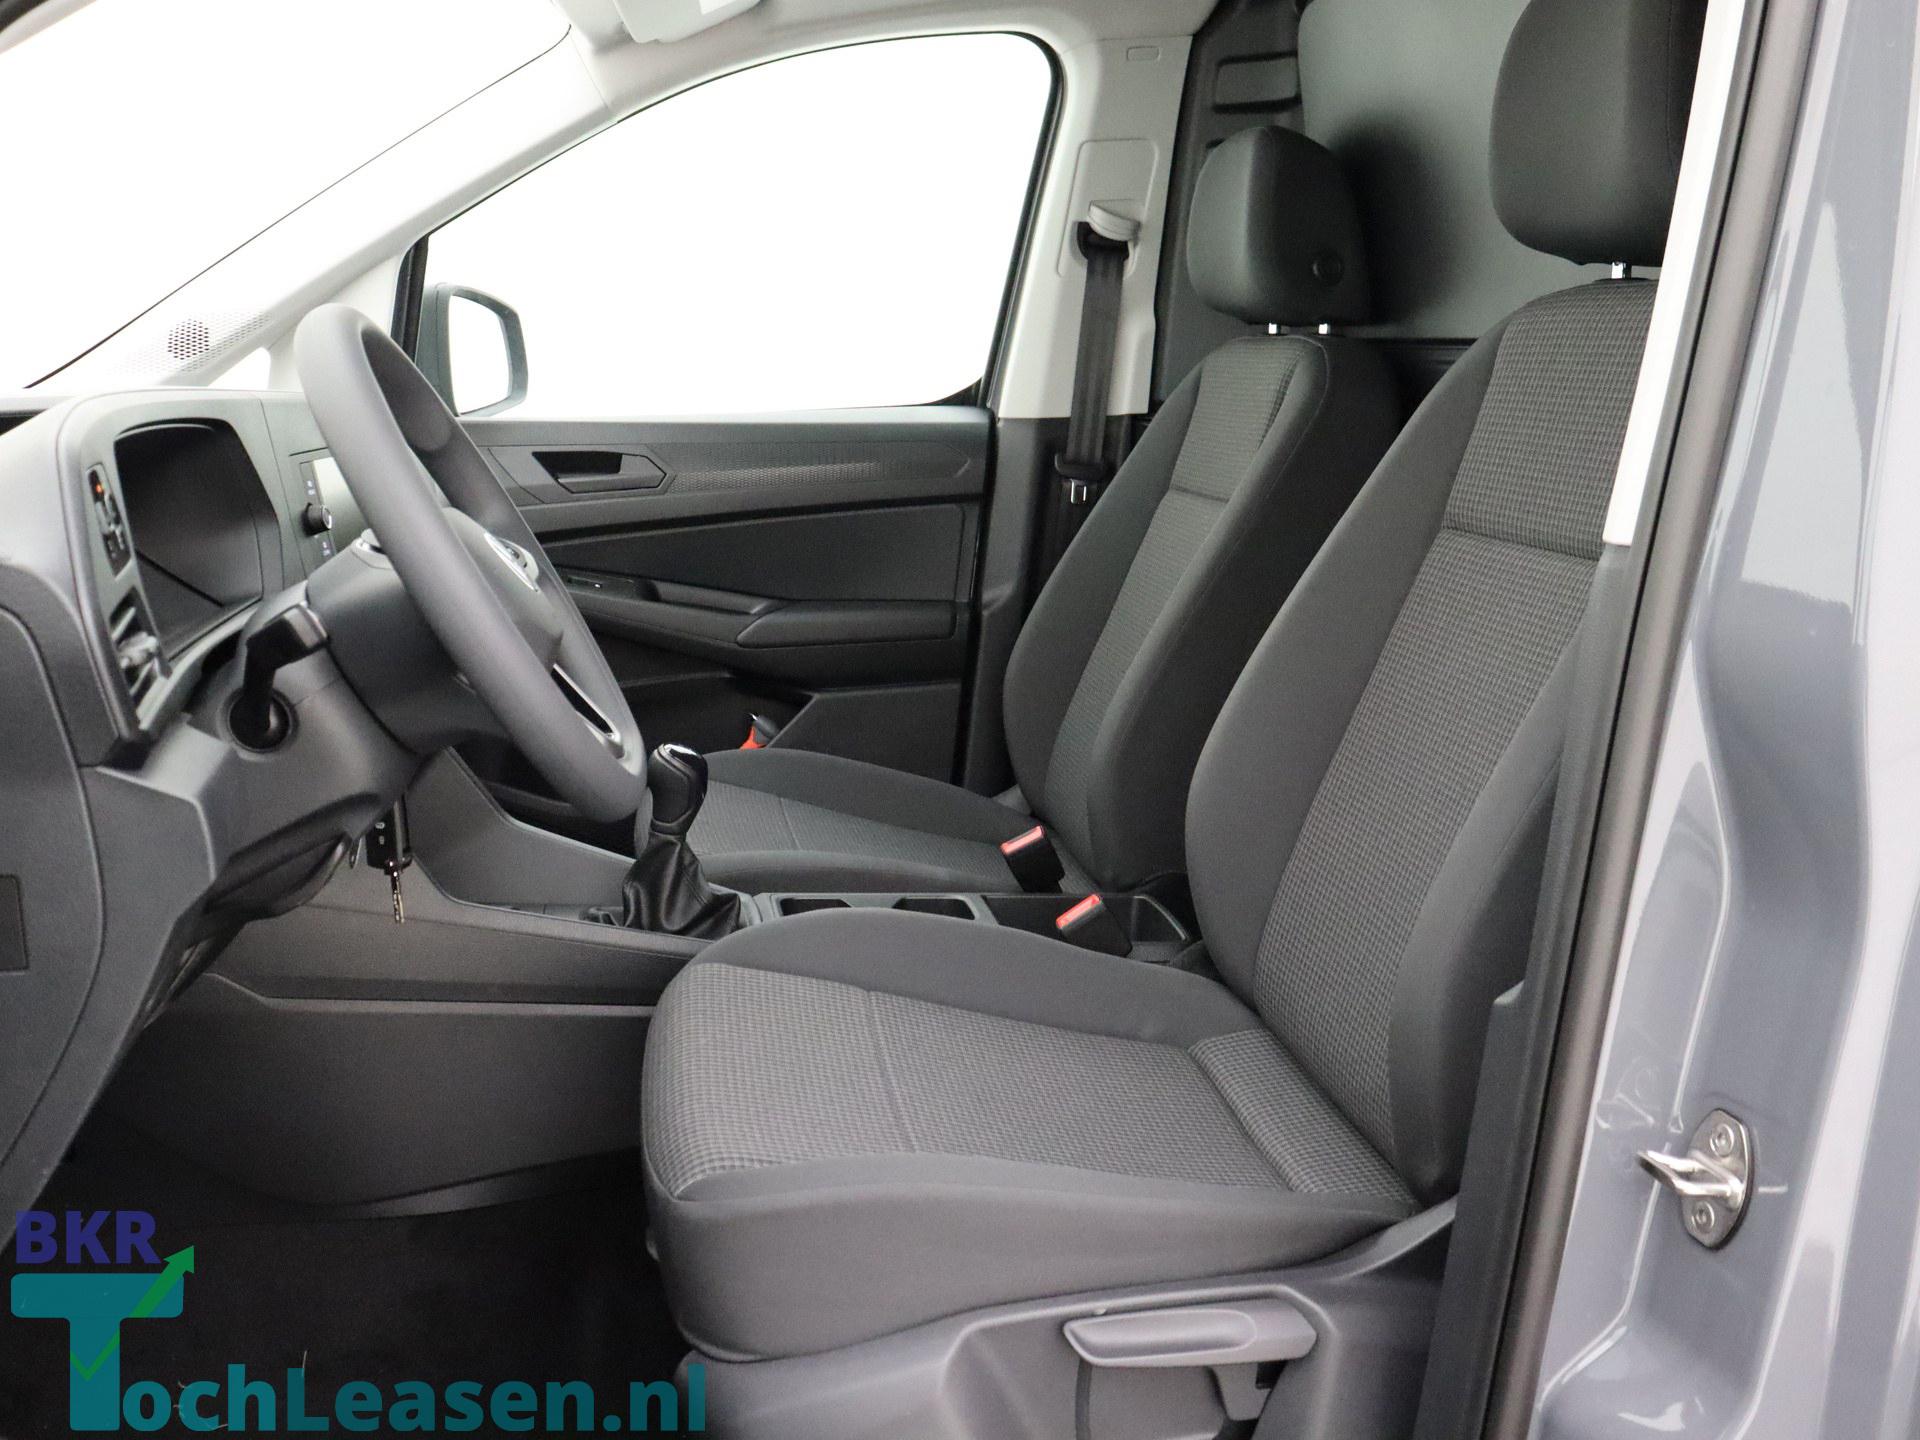 BKR toch leasen - Volkswagen Caddy - Grijs 12